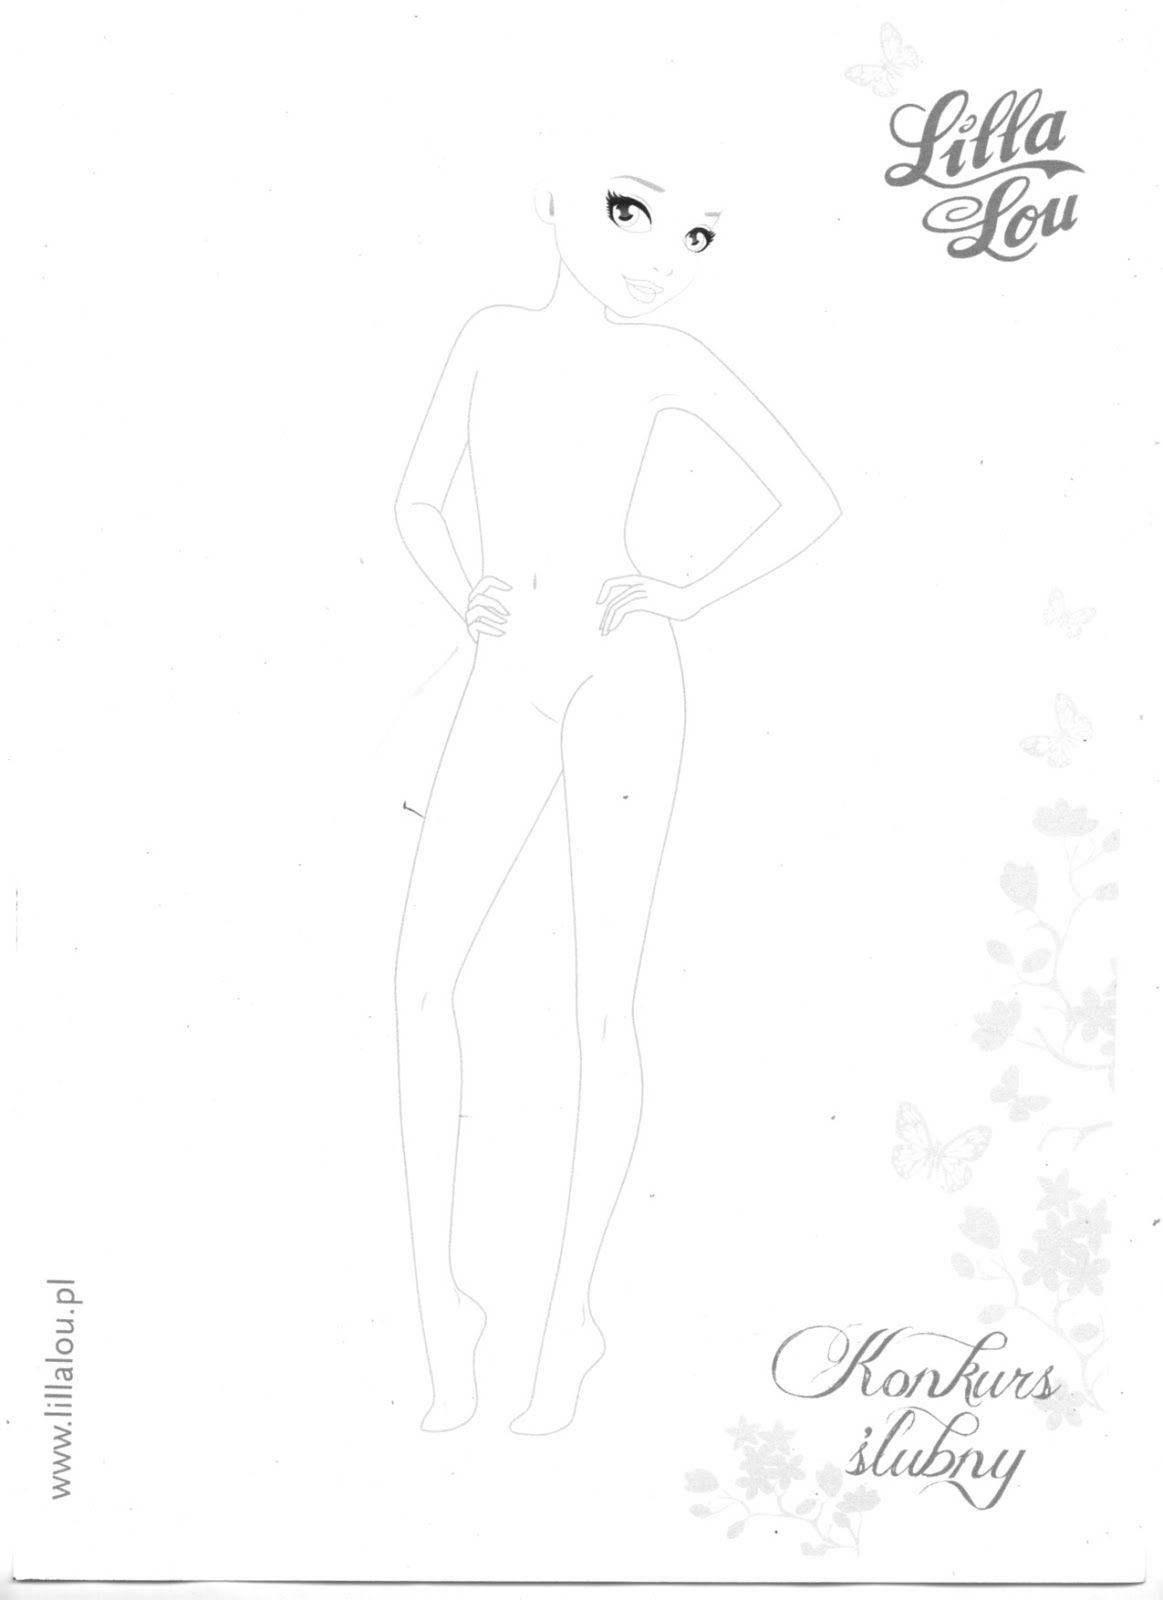 Pingl par olga helwich sur topmodel mannequin drawing design model et model - Top model coloriage livre ...